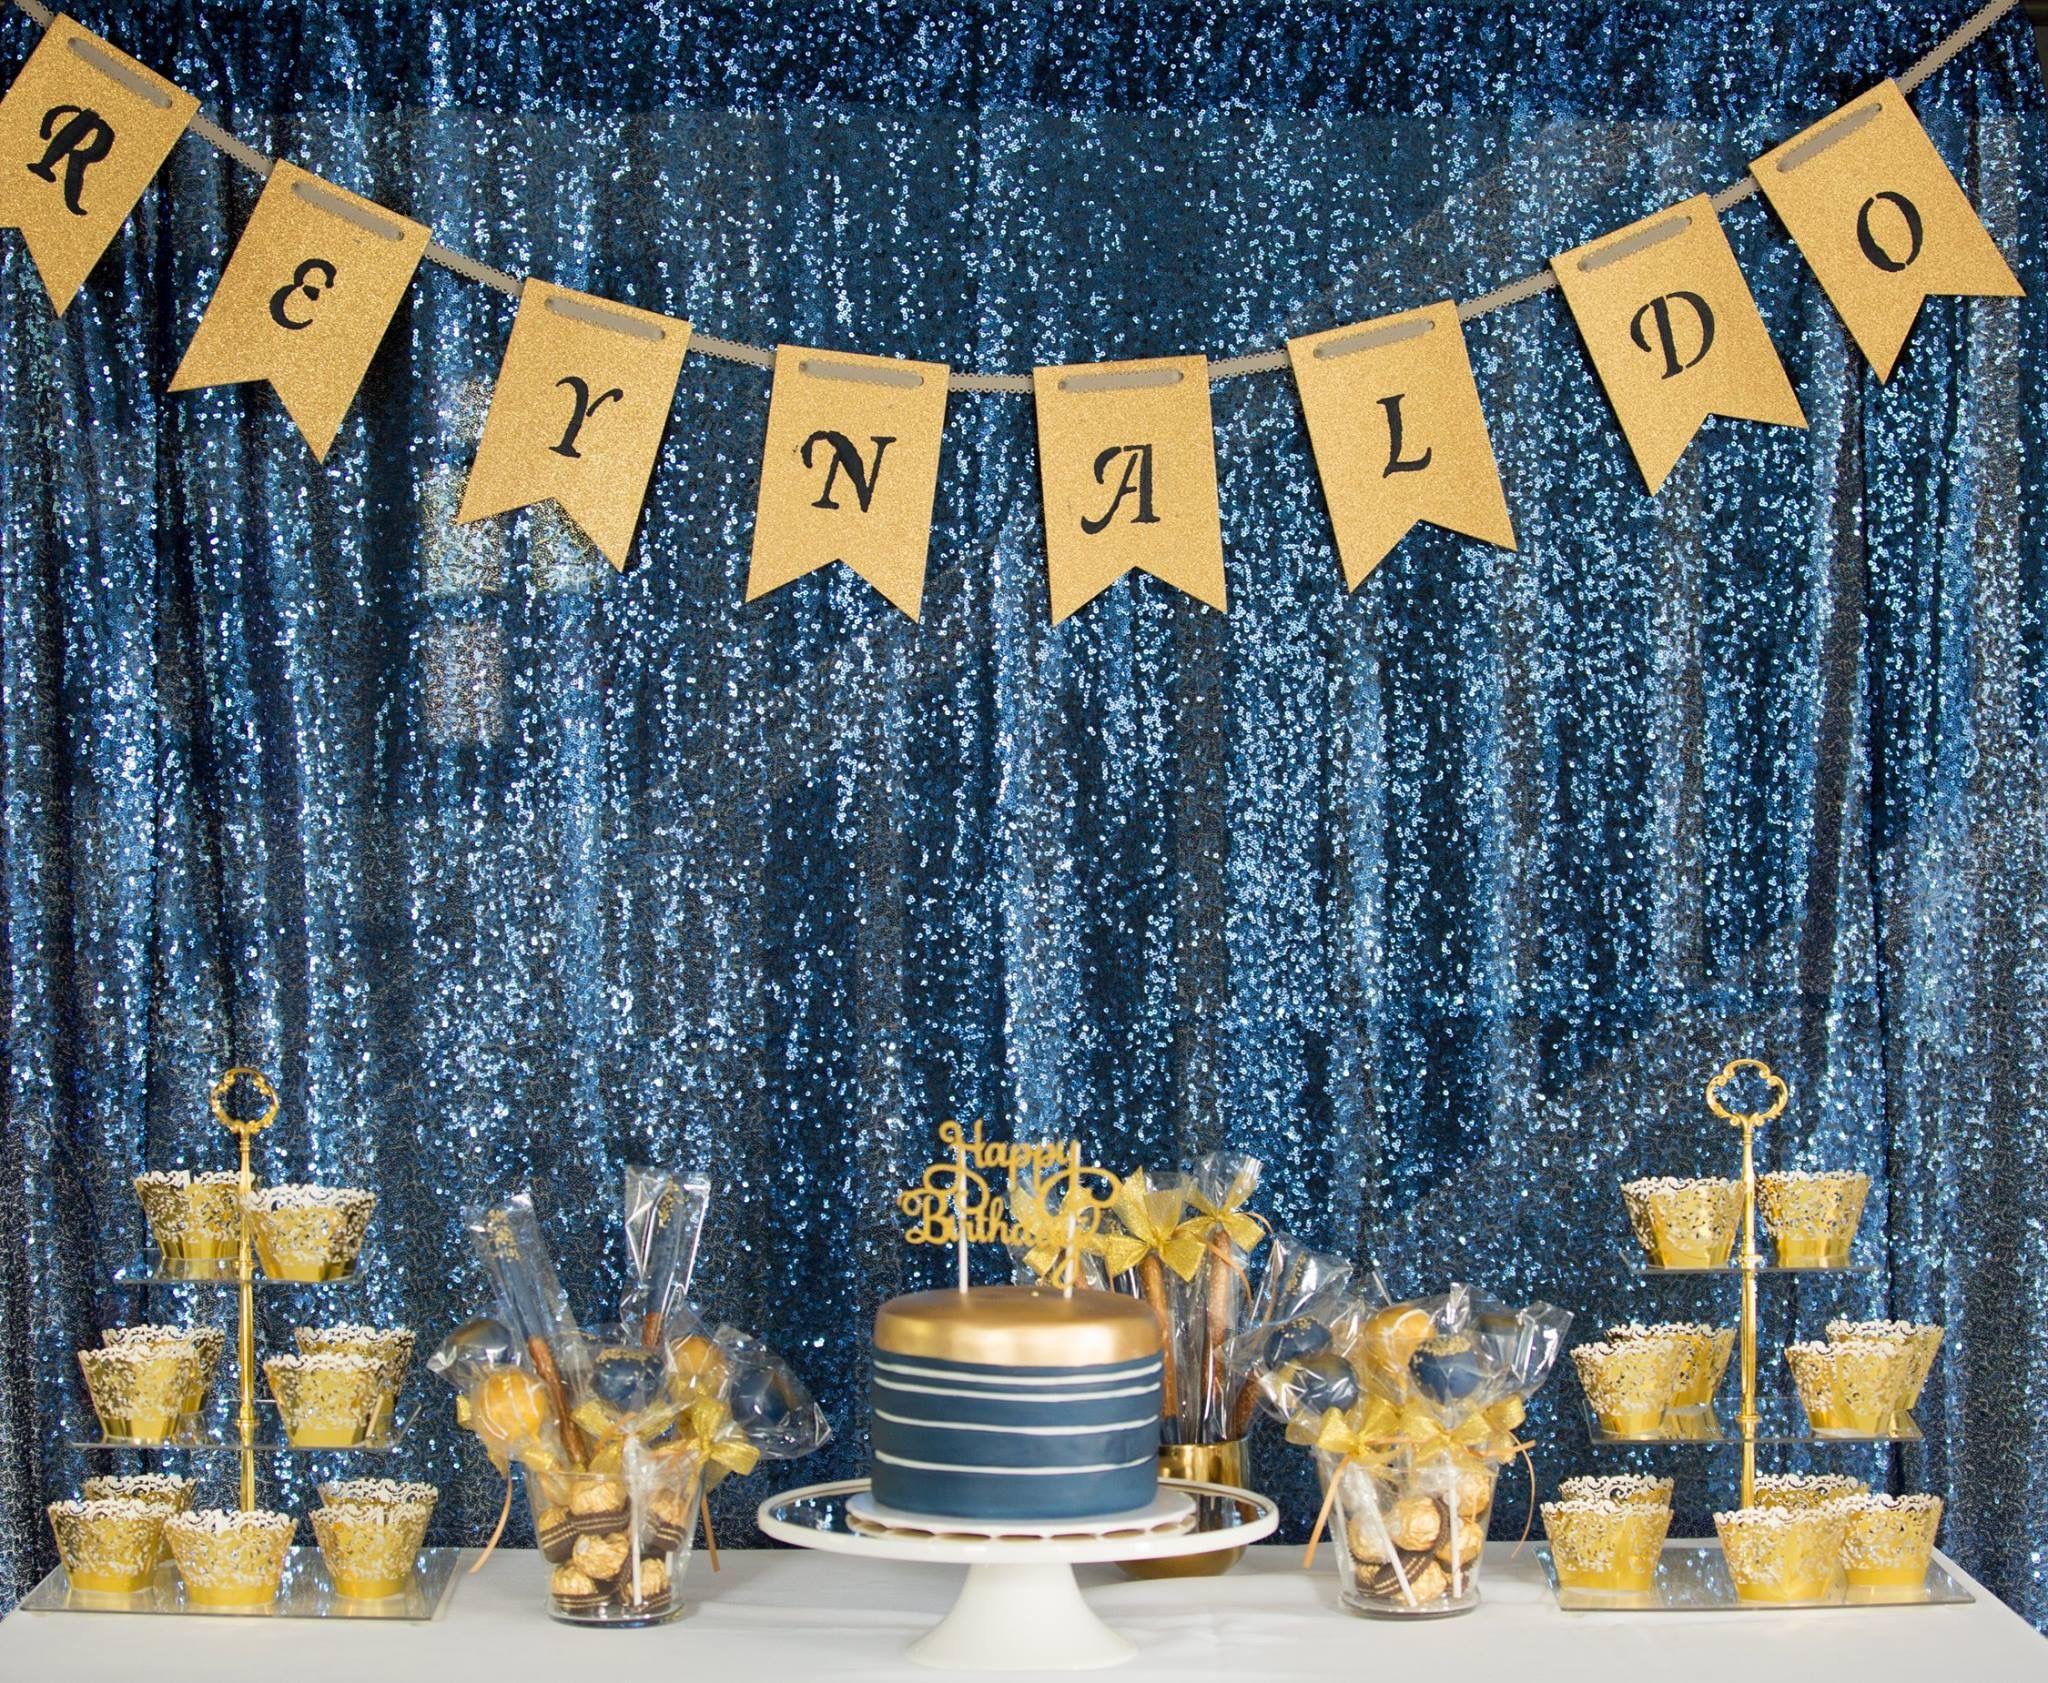 Reynaldo gold and royal blue DIY banner Royal blue and gold Party decor |  p… | Gold party decorations diy, Gold party decorations, Black and gold  party decorations